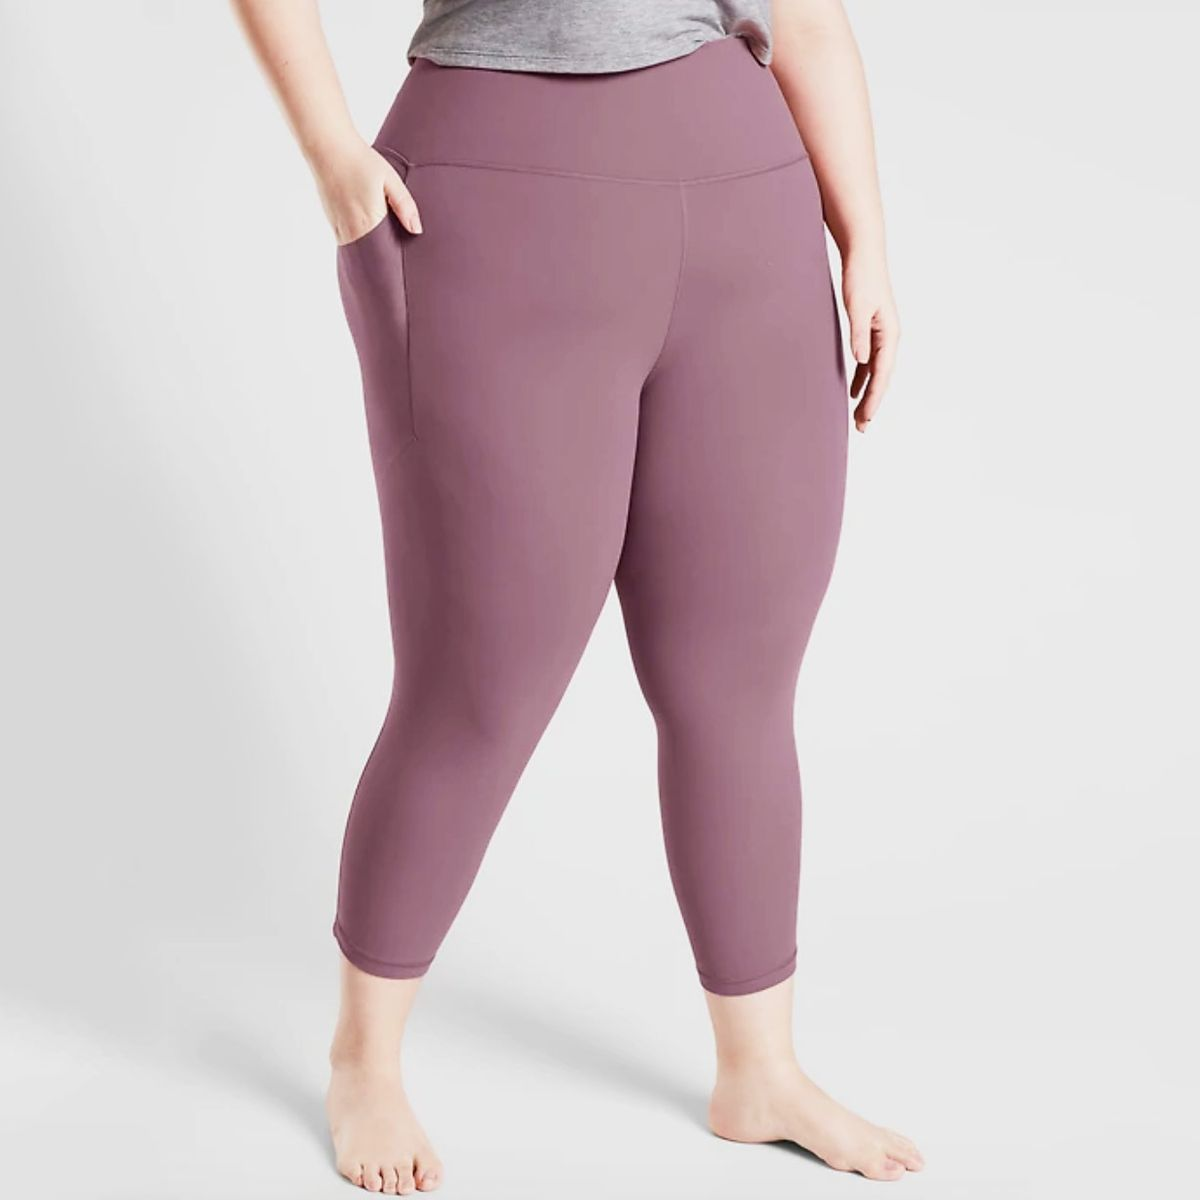 YYear Women Yoga Legging Camo Print Workout Bodysuit Summer Long Pants